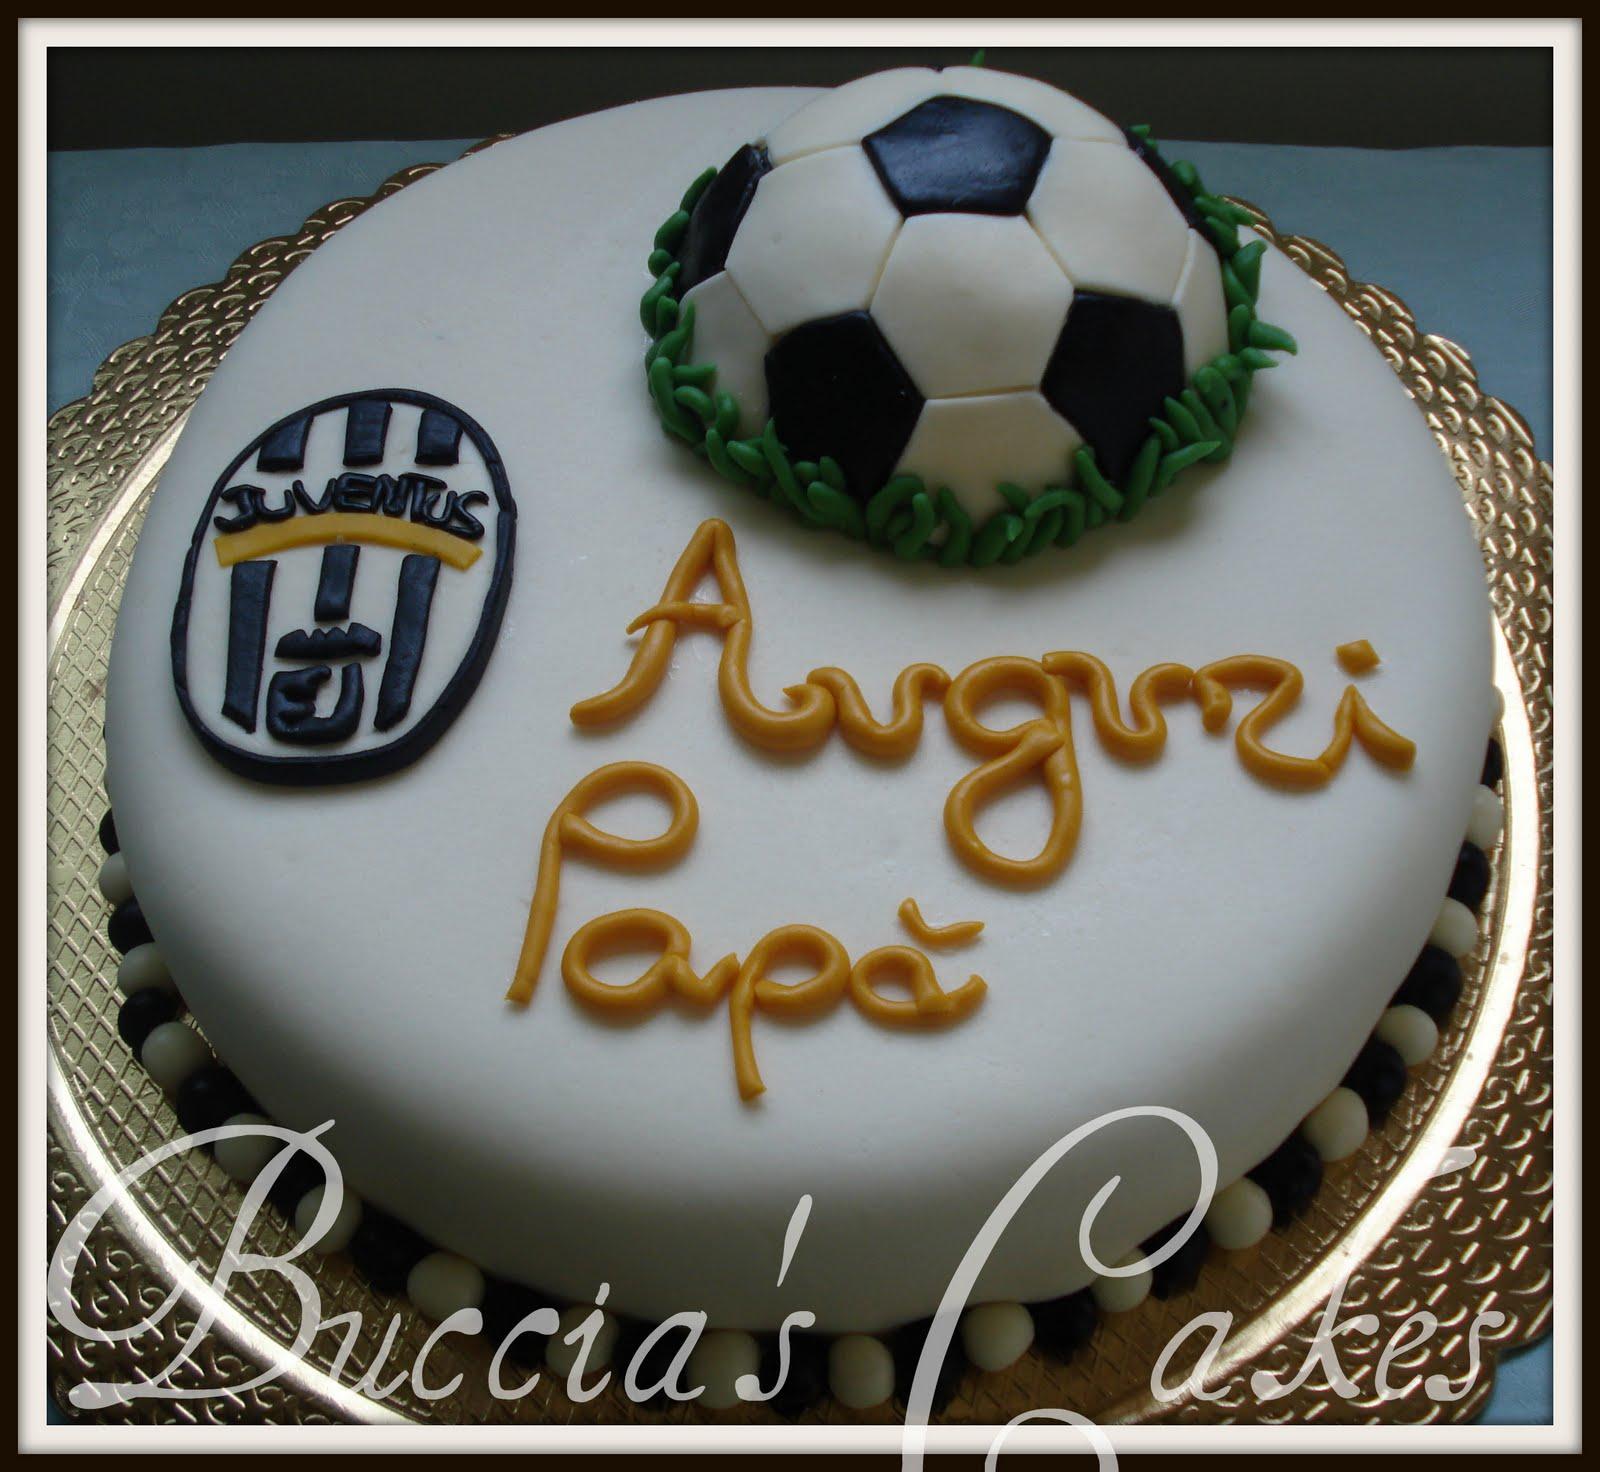 Bien-aimé Buccia's Cakes: Torta Juventus JX59